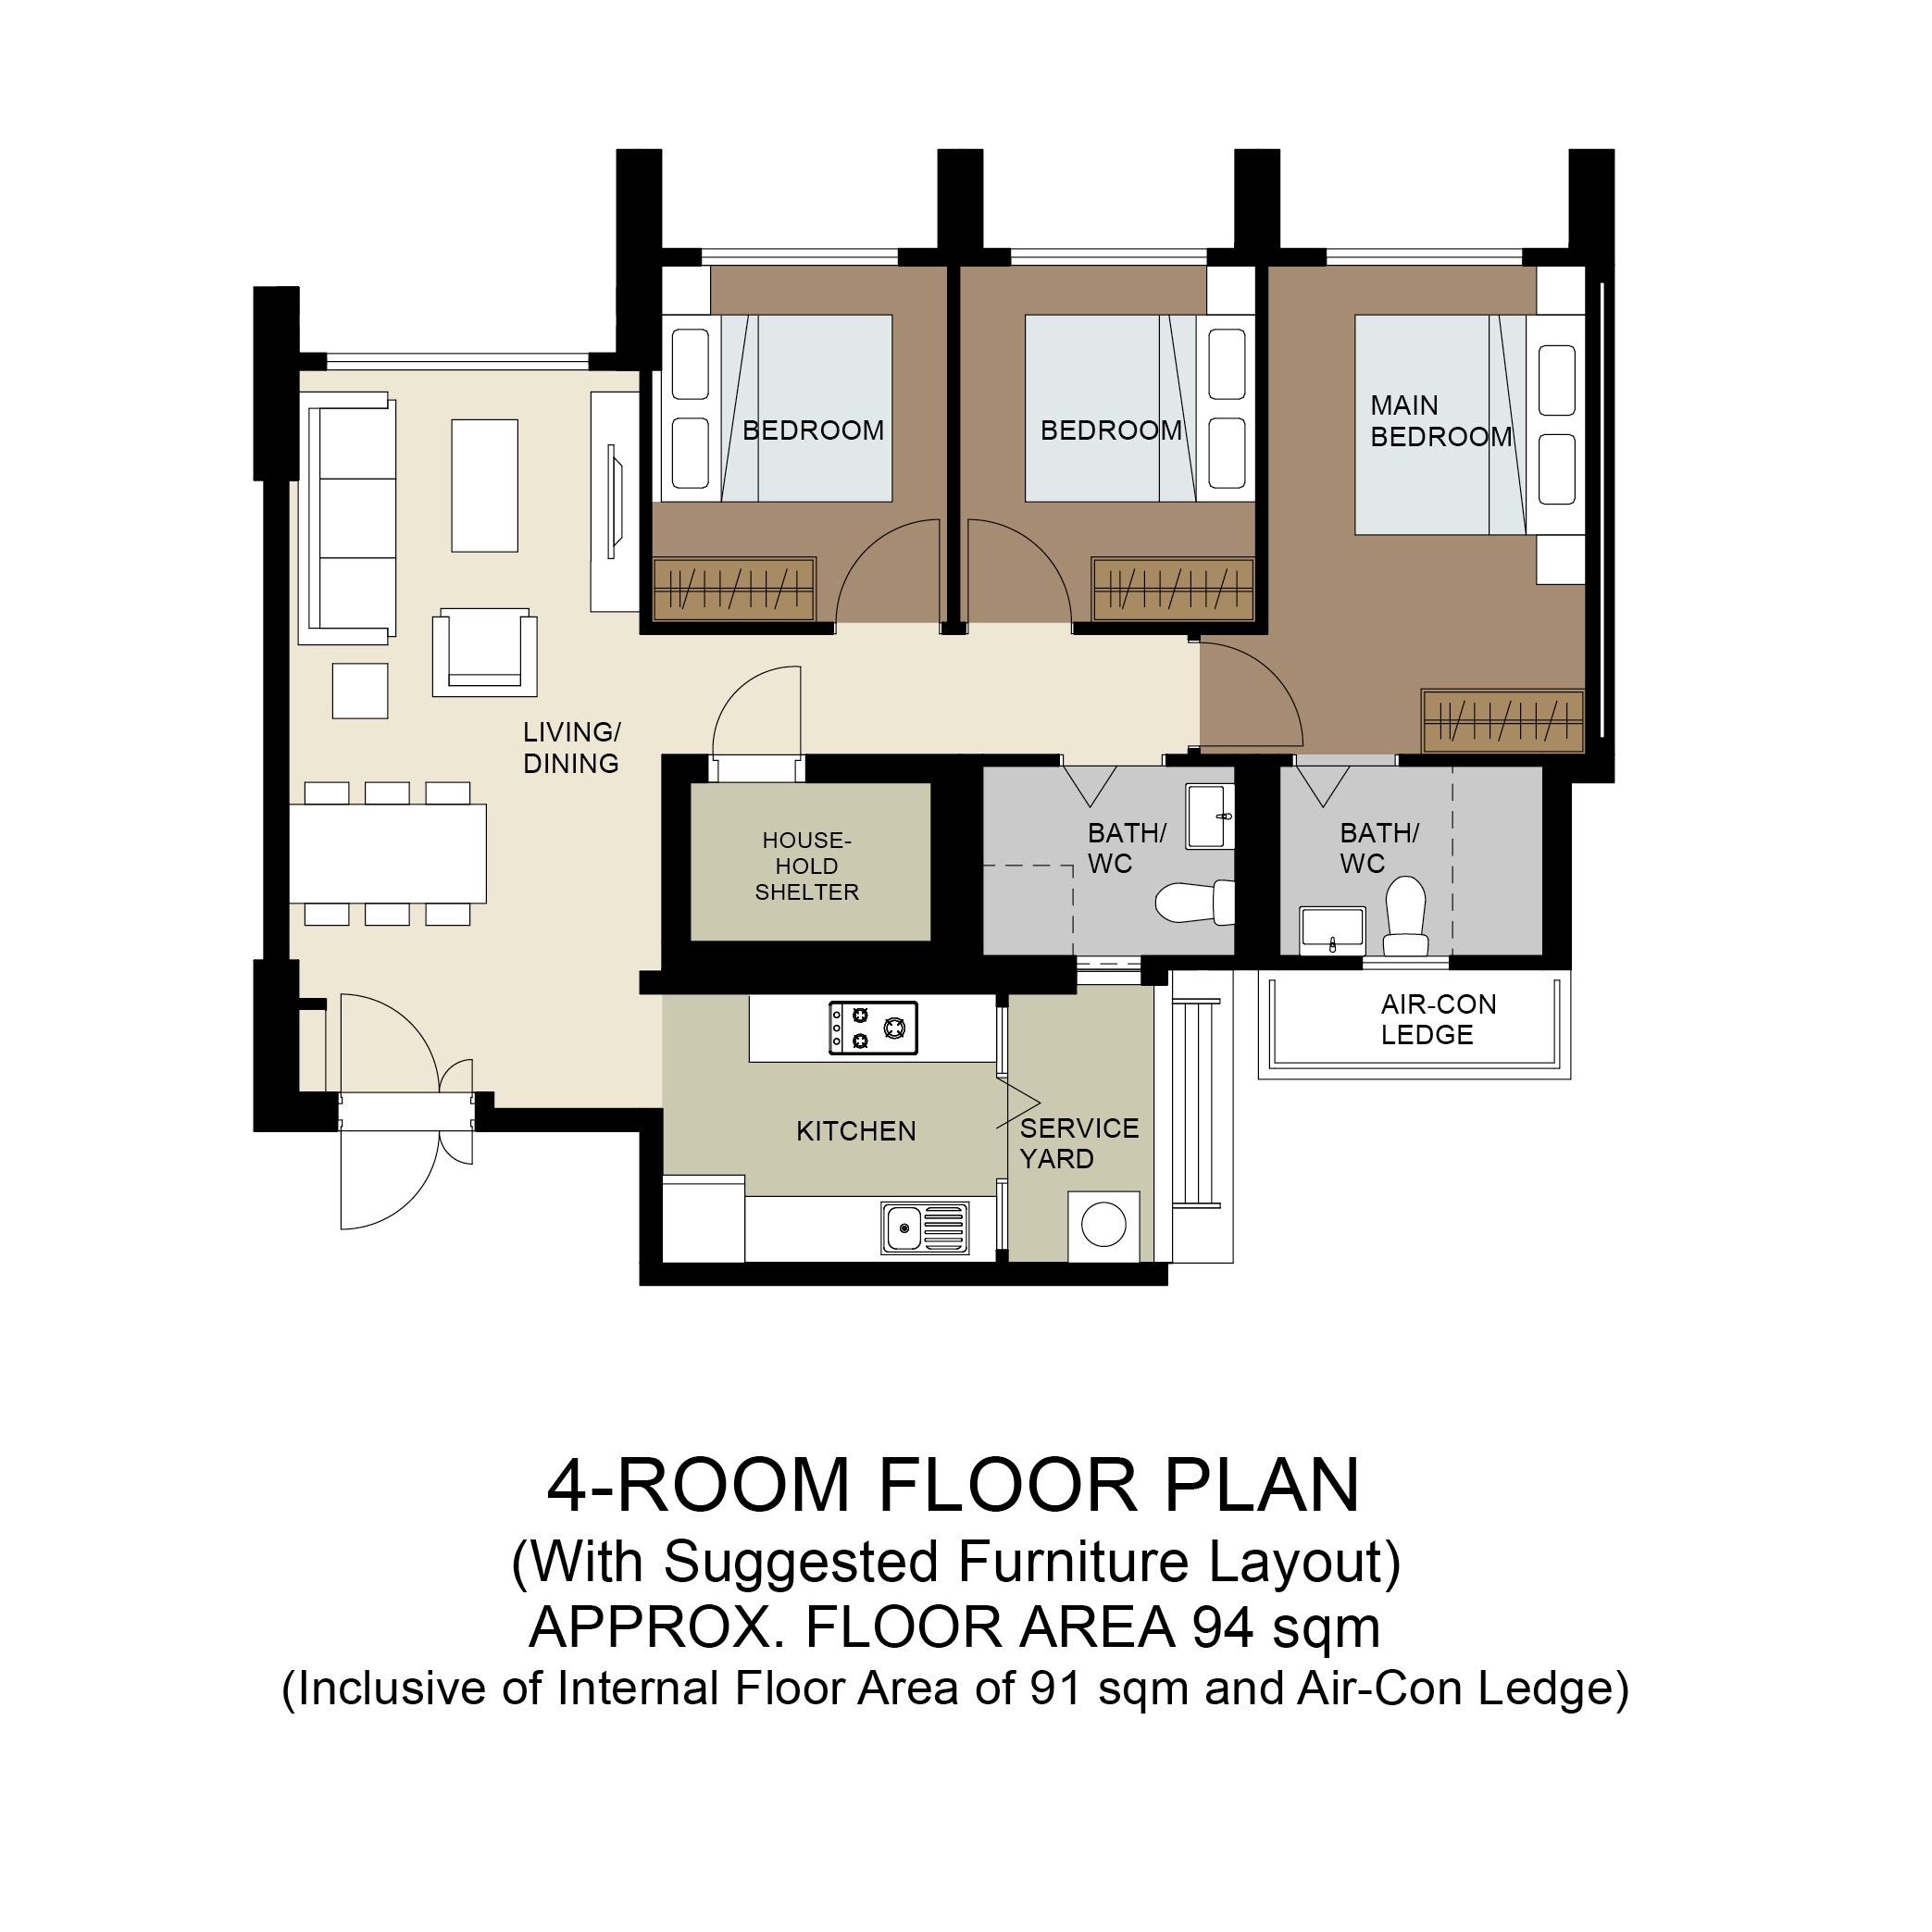 Plantation Acres Floor Plan 4-Room